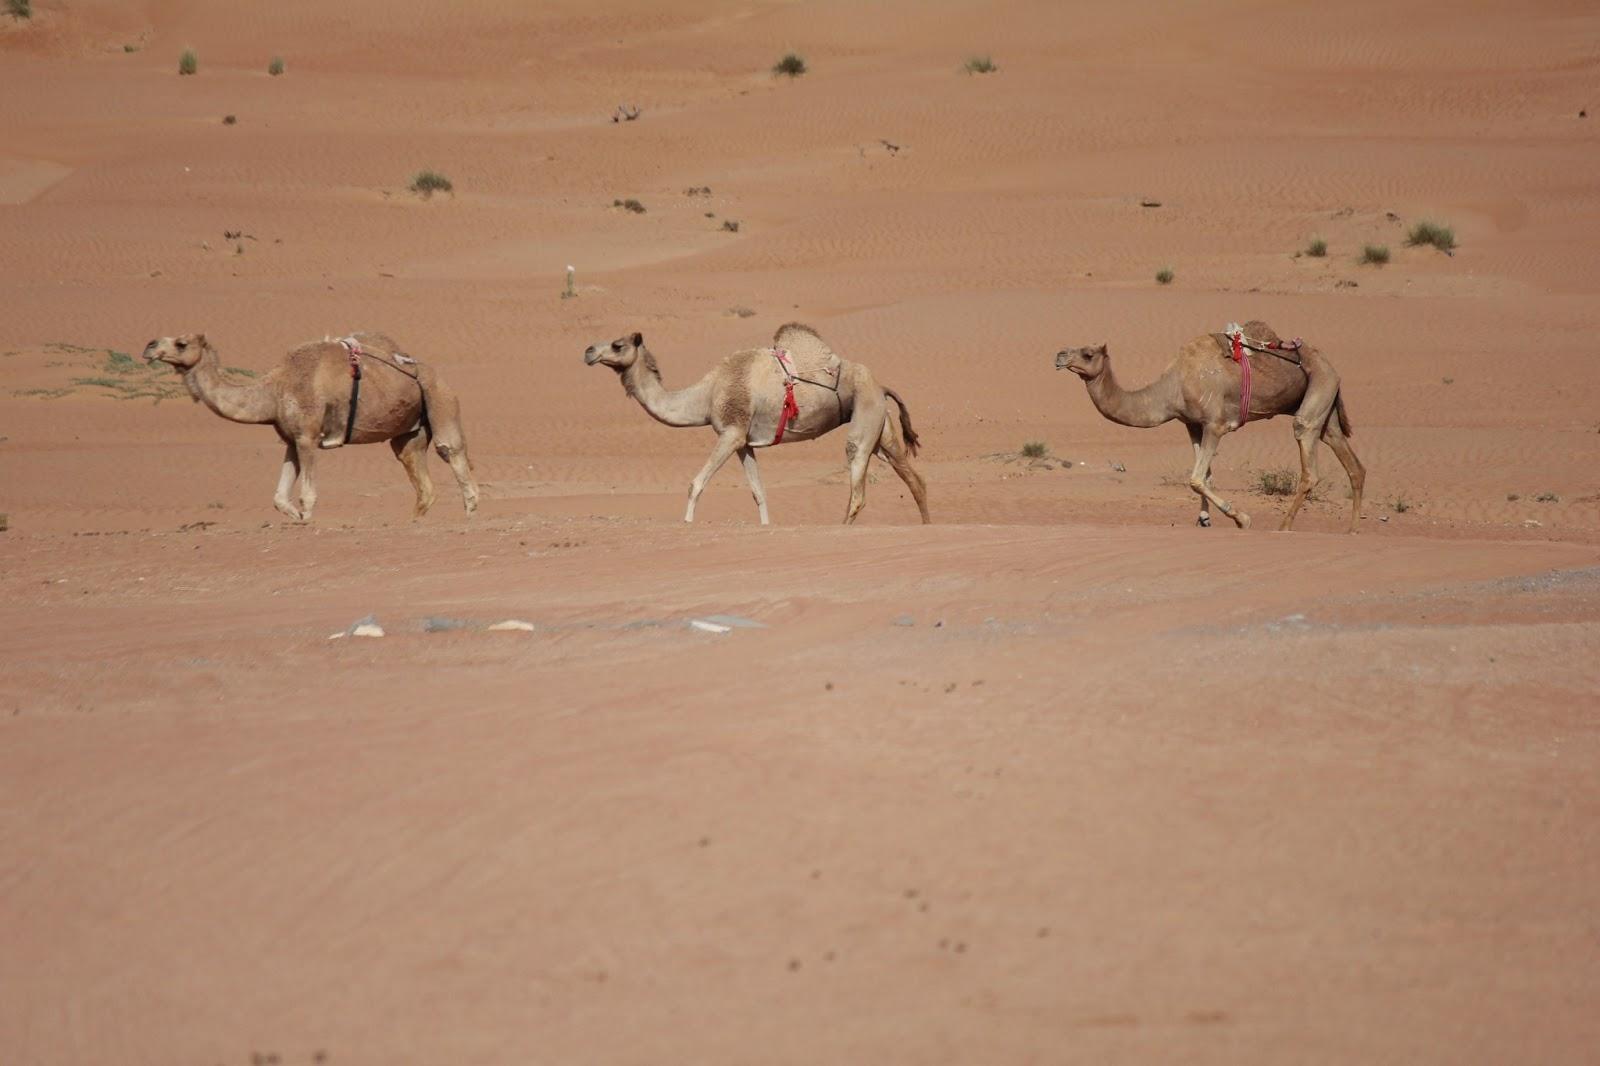 survival in a desert essay